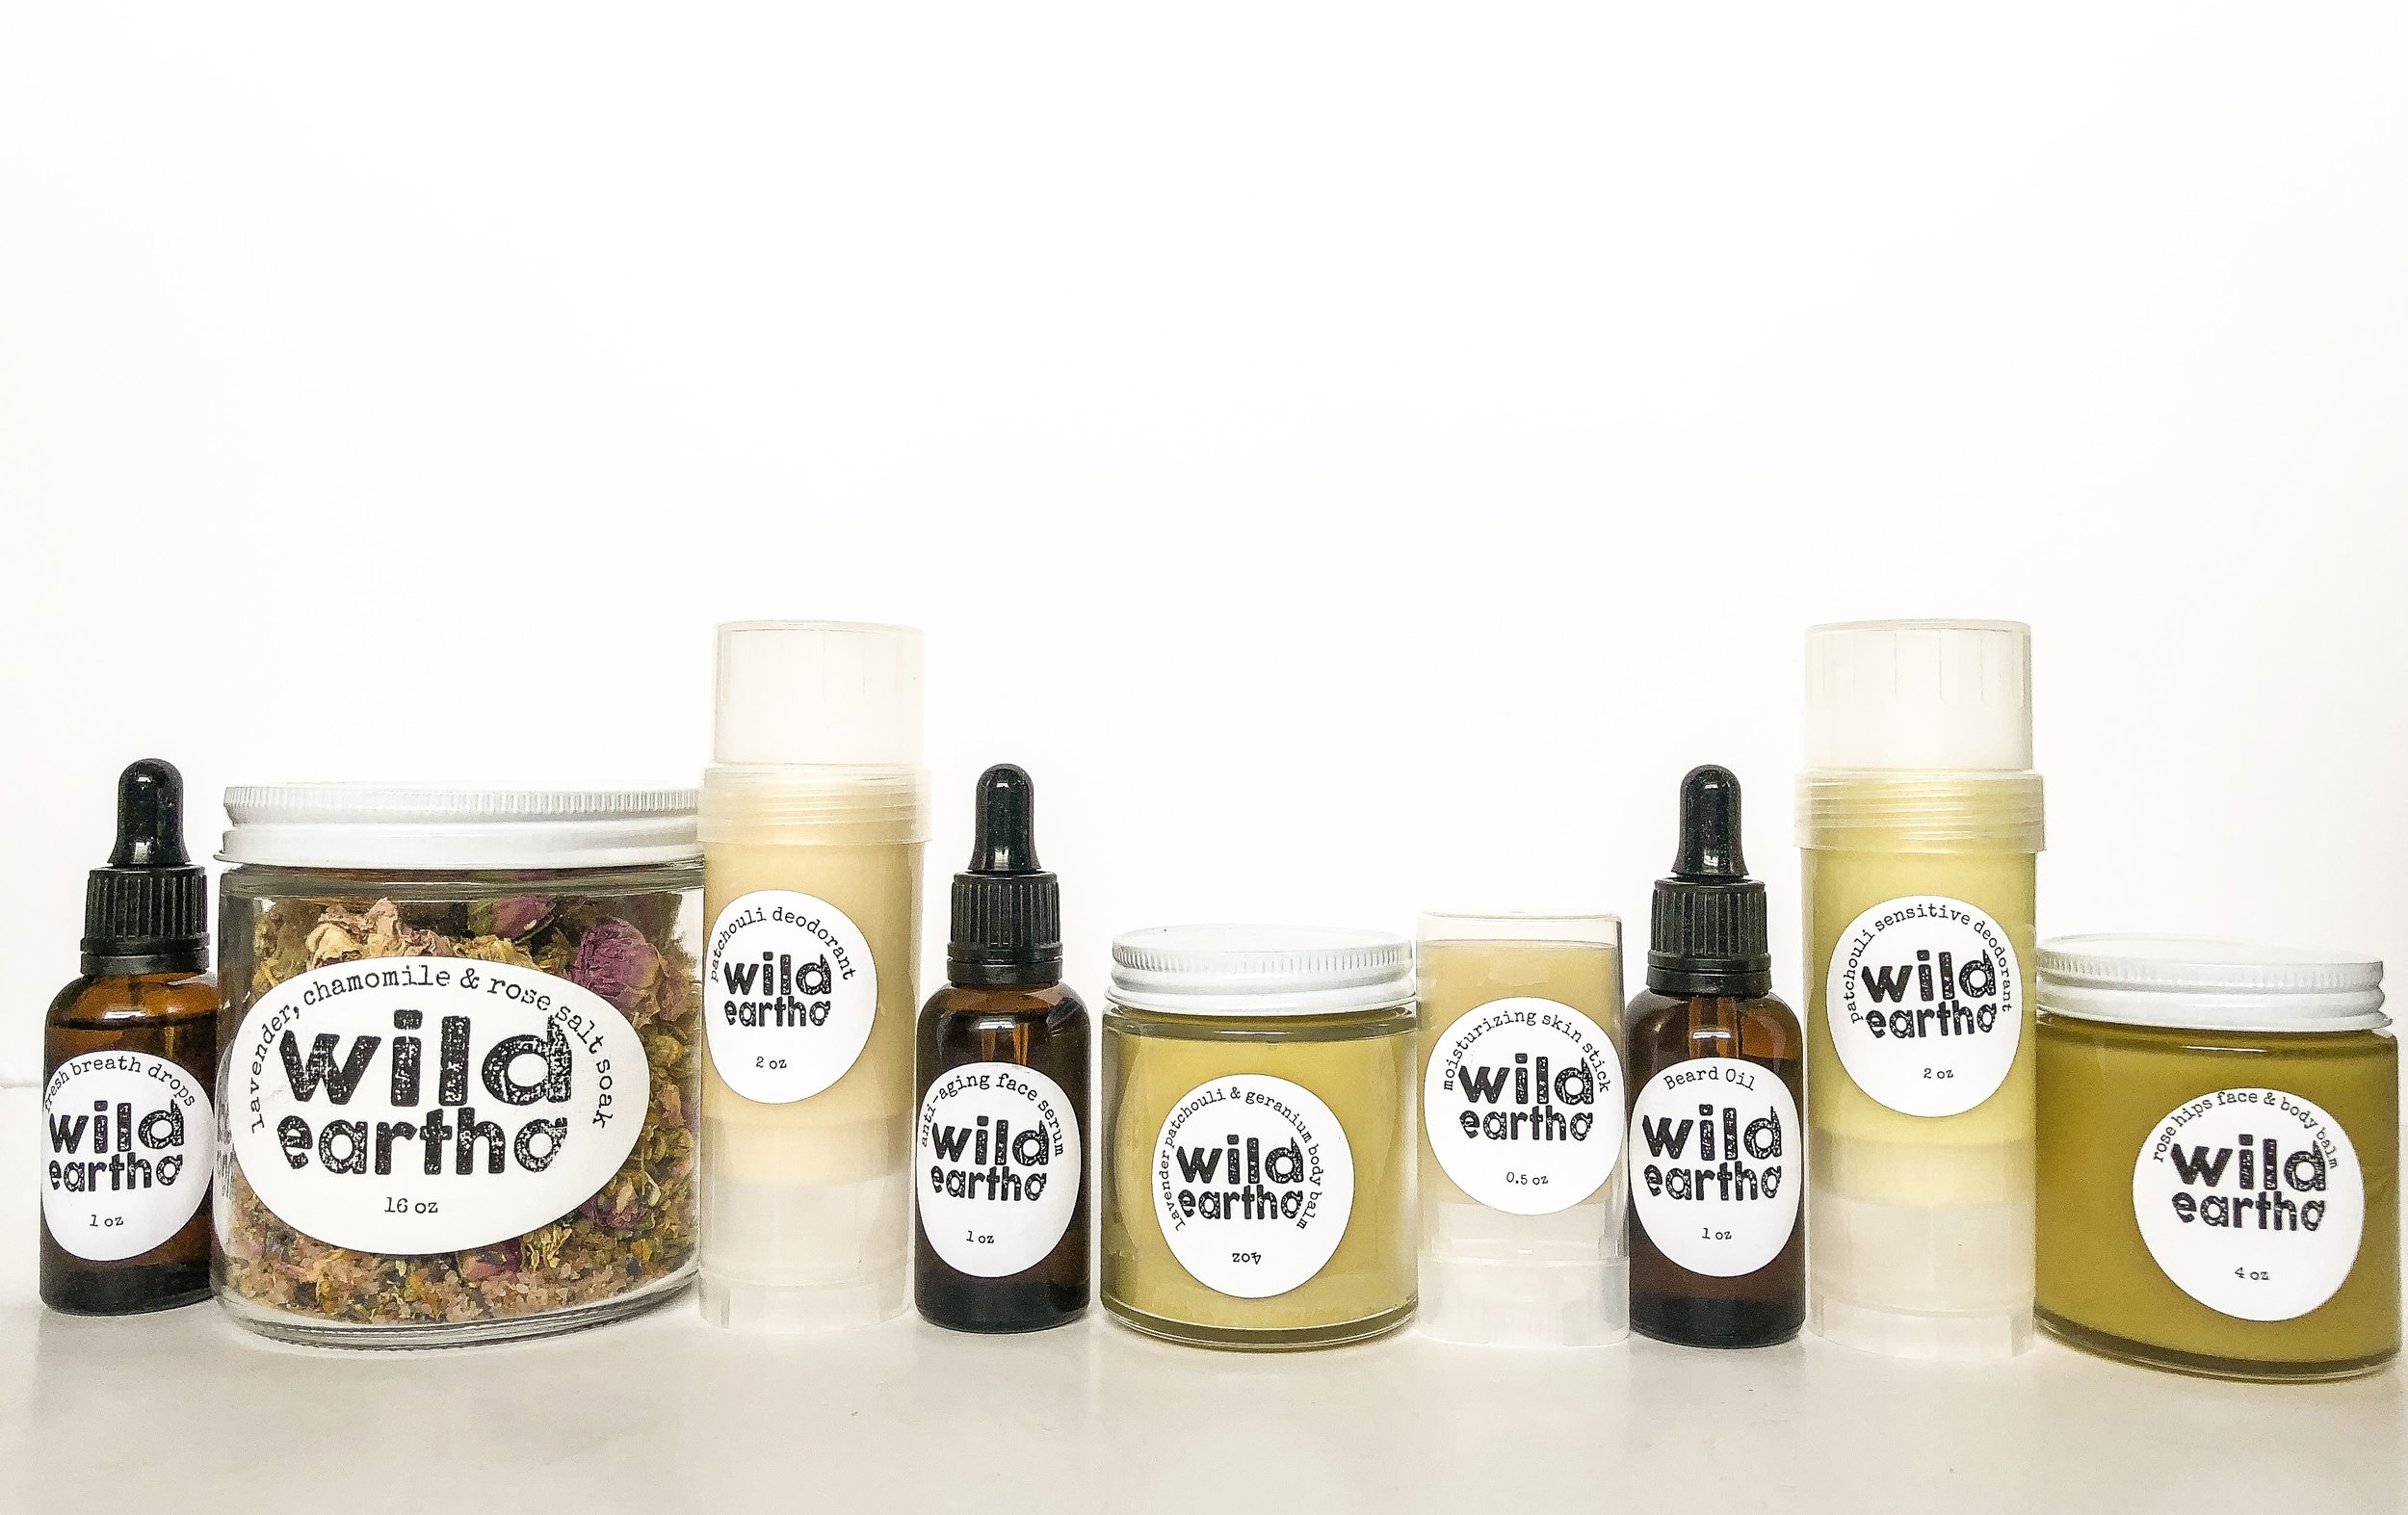 wild eartha products 2.jpeg